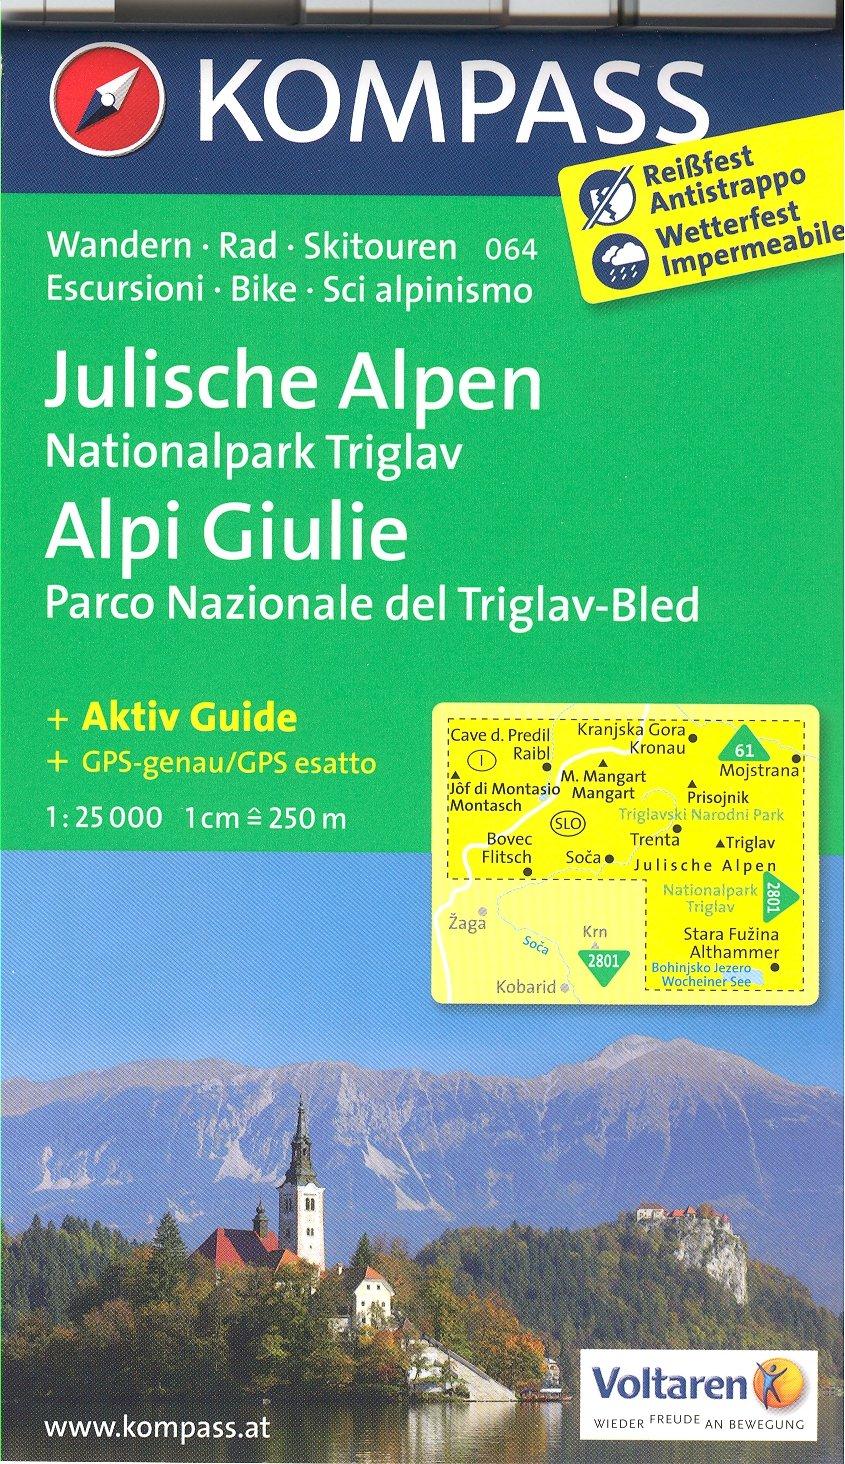 Portorose Slovenia Cartina Geografica.Amazon It Alpi Giulie Np Triglav Bled Slovenia 1 25 000 Carta Escursionistica Topografica 064 Kompass Kompassmaps Libri